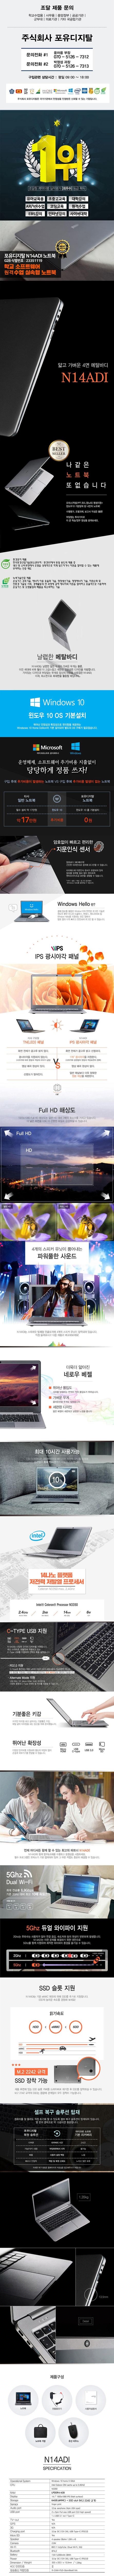 N14ADI 상품소개